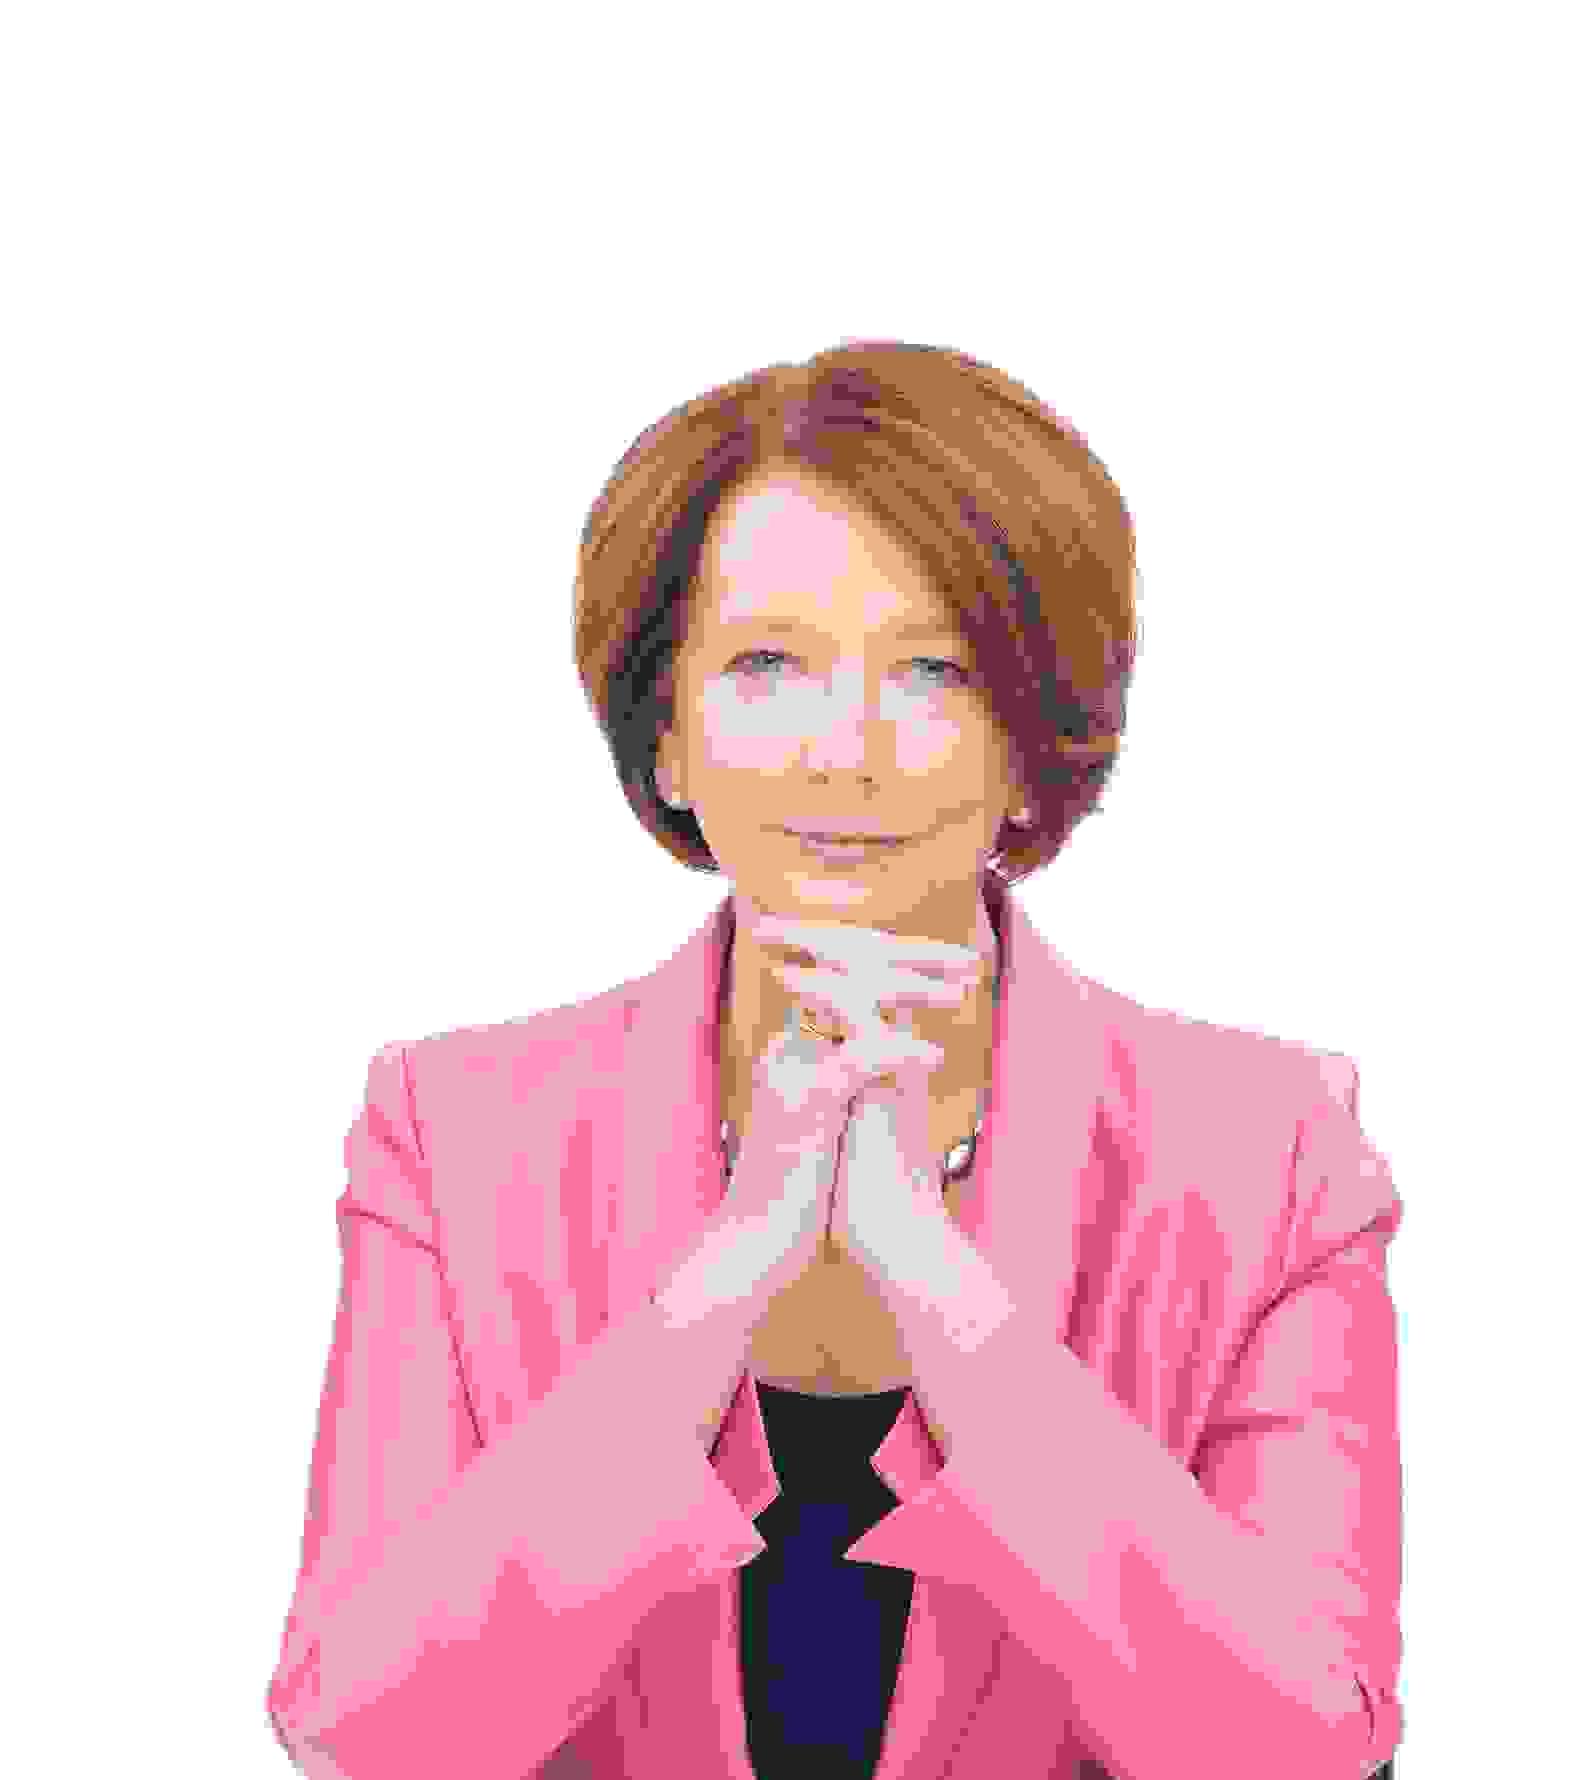 Julia Gillard: On Power and Gender